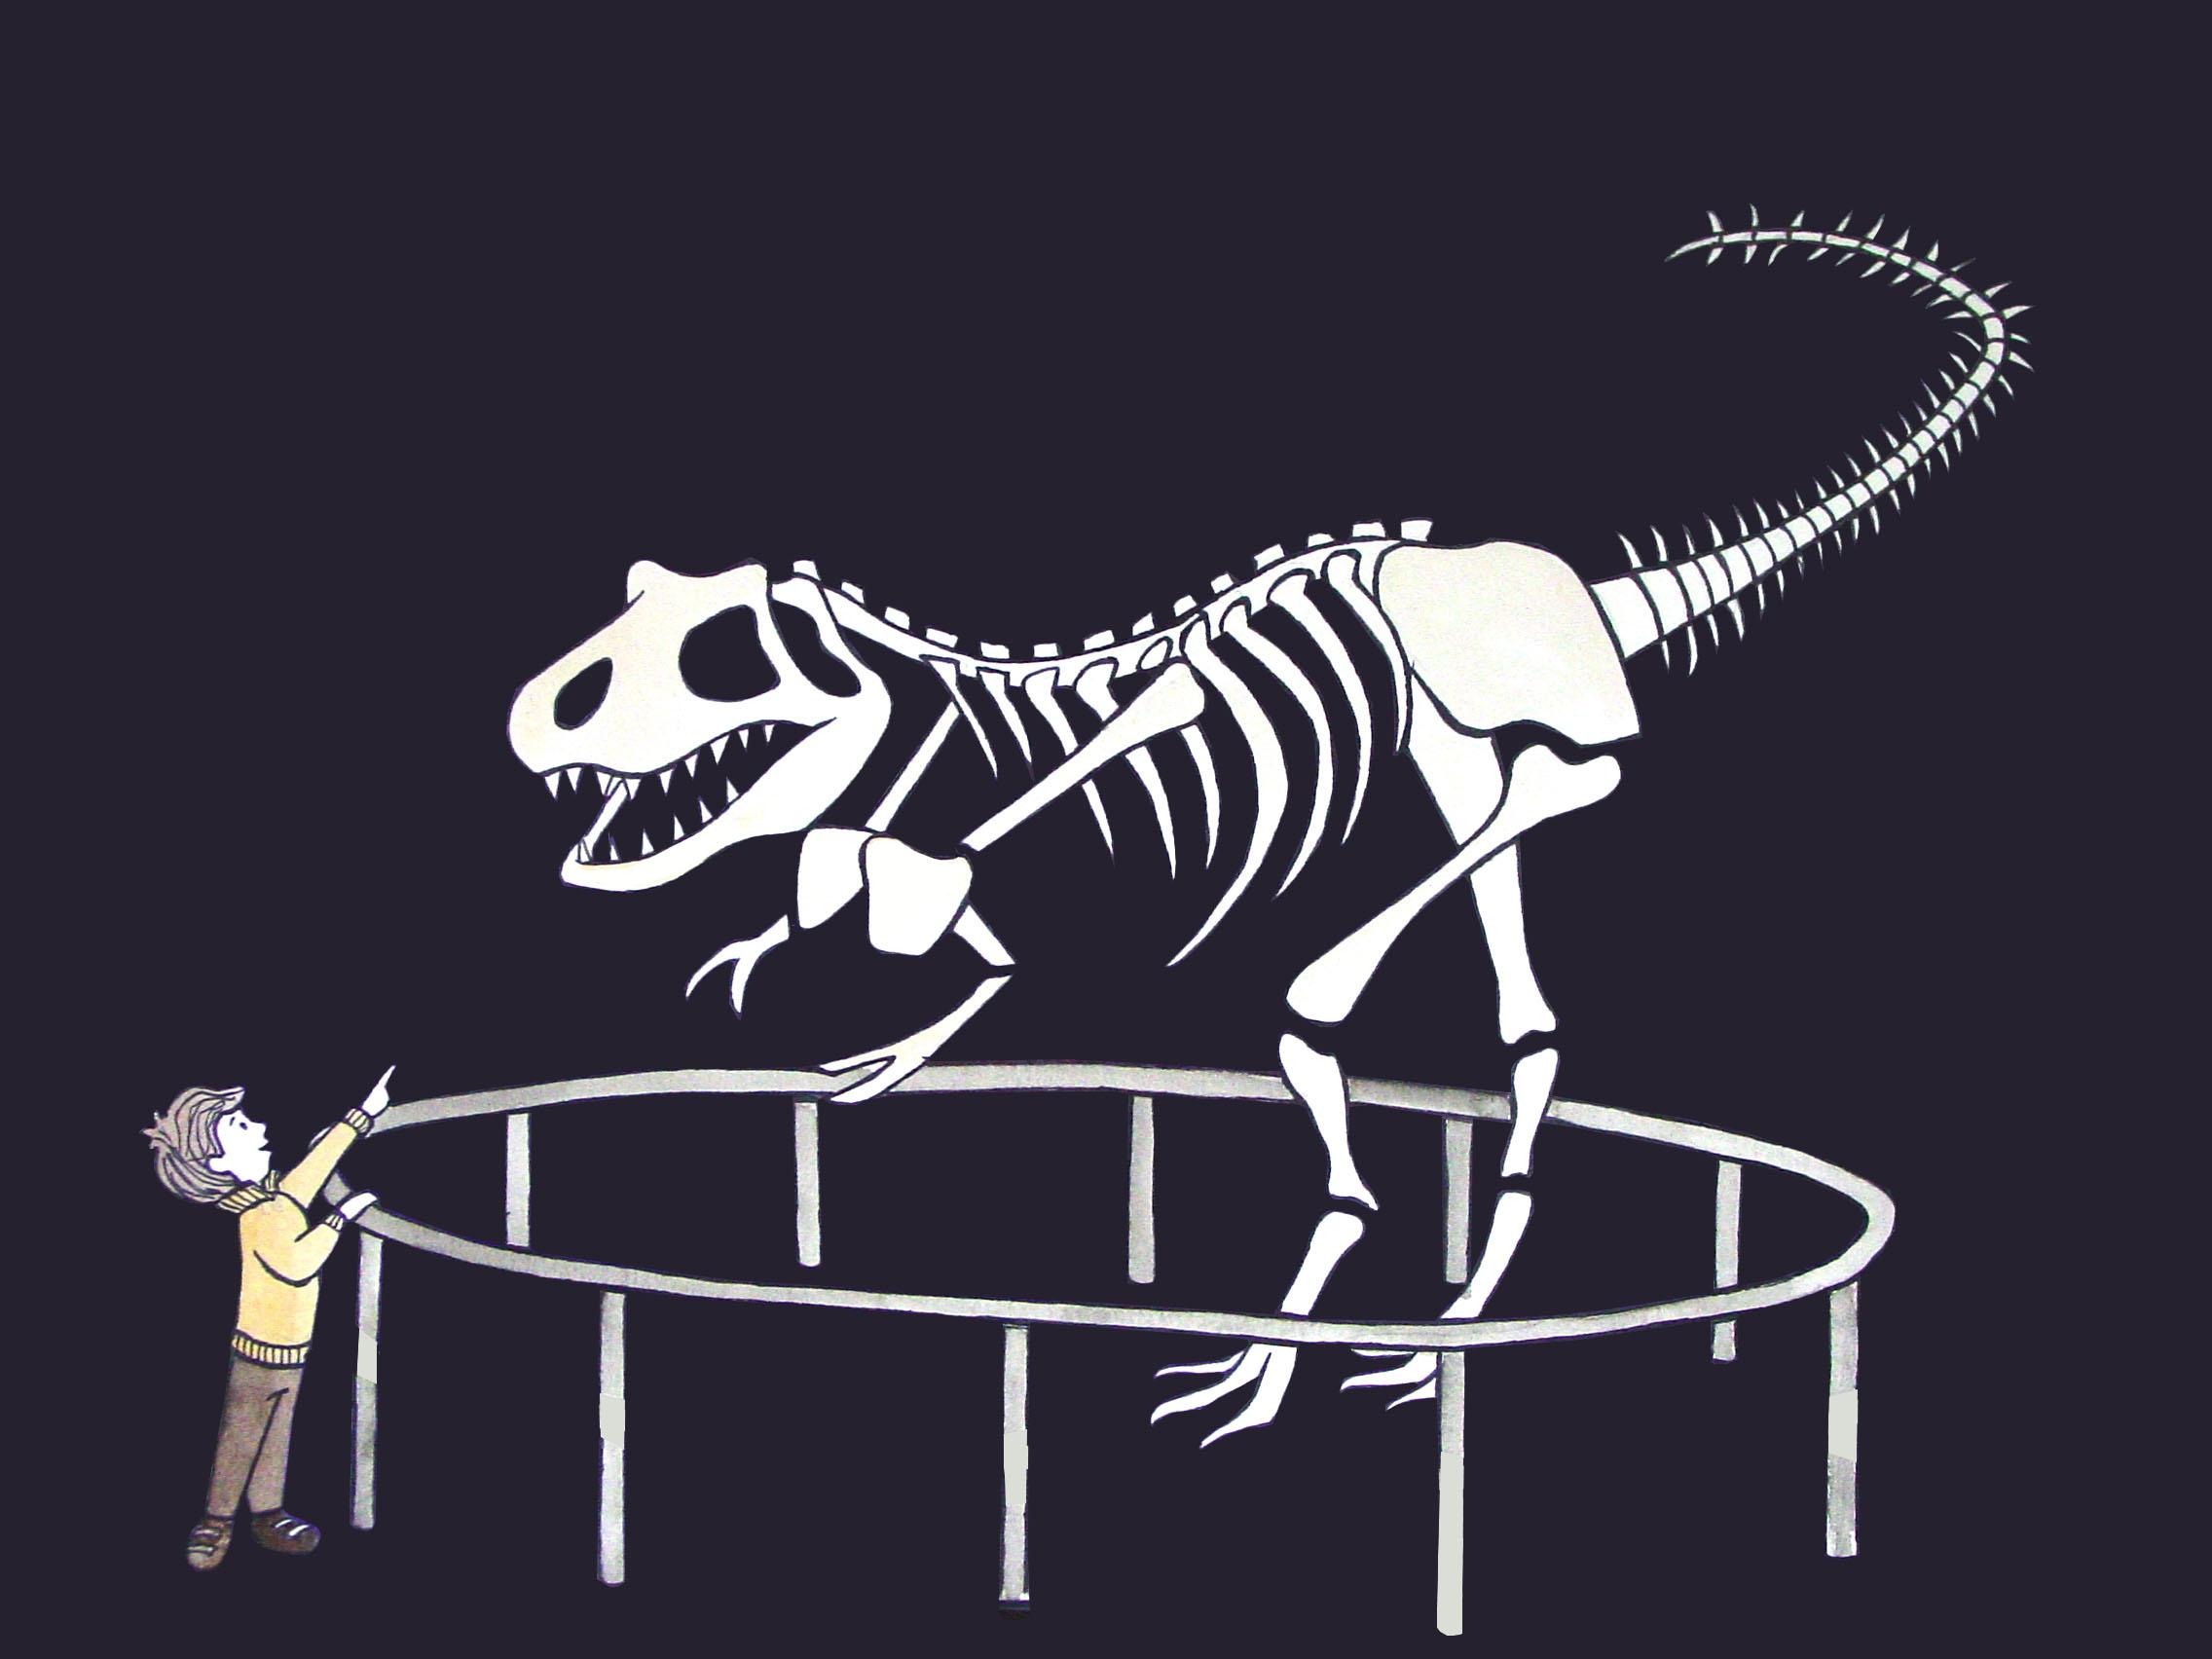 Pietro and T-Rex